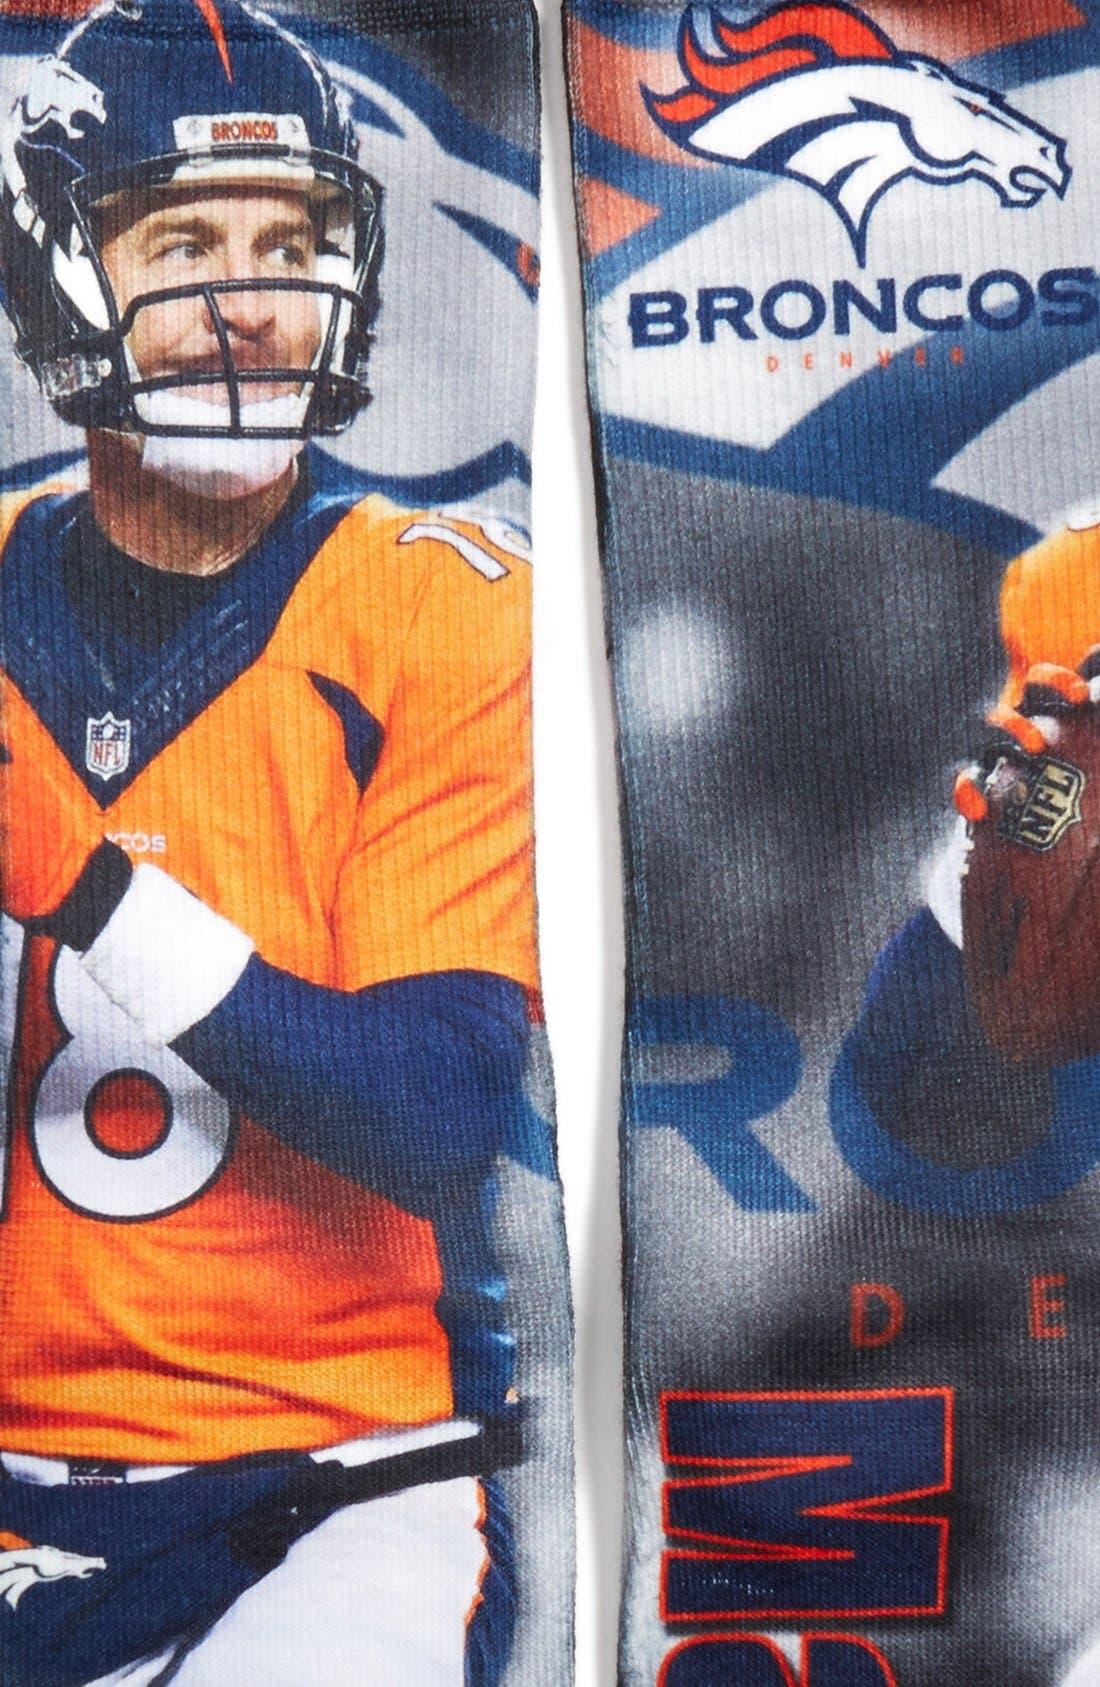 'Denver Broncos - Peyton Manning' Socks,                             Alternate thumbnail 2, color,                             001